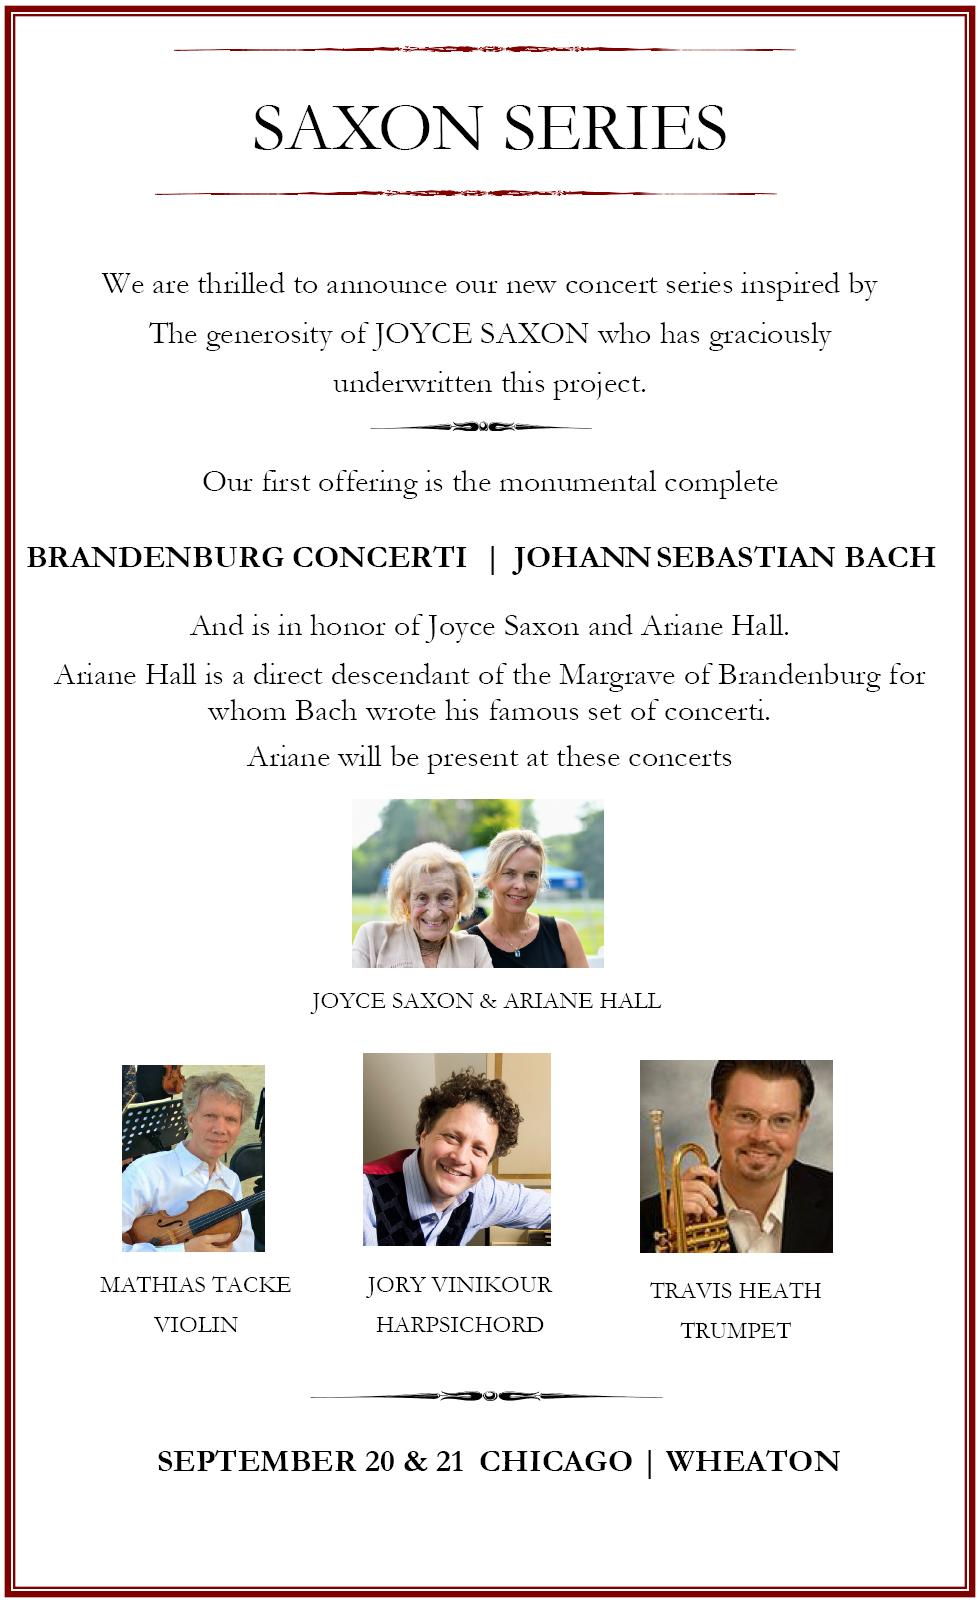 SAXON-SERIES: Complete Brandenburg Concerti Sep 20 & 21